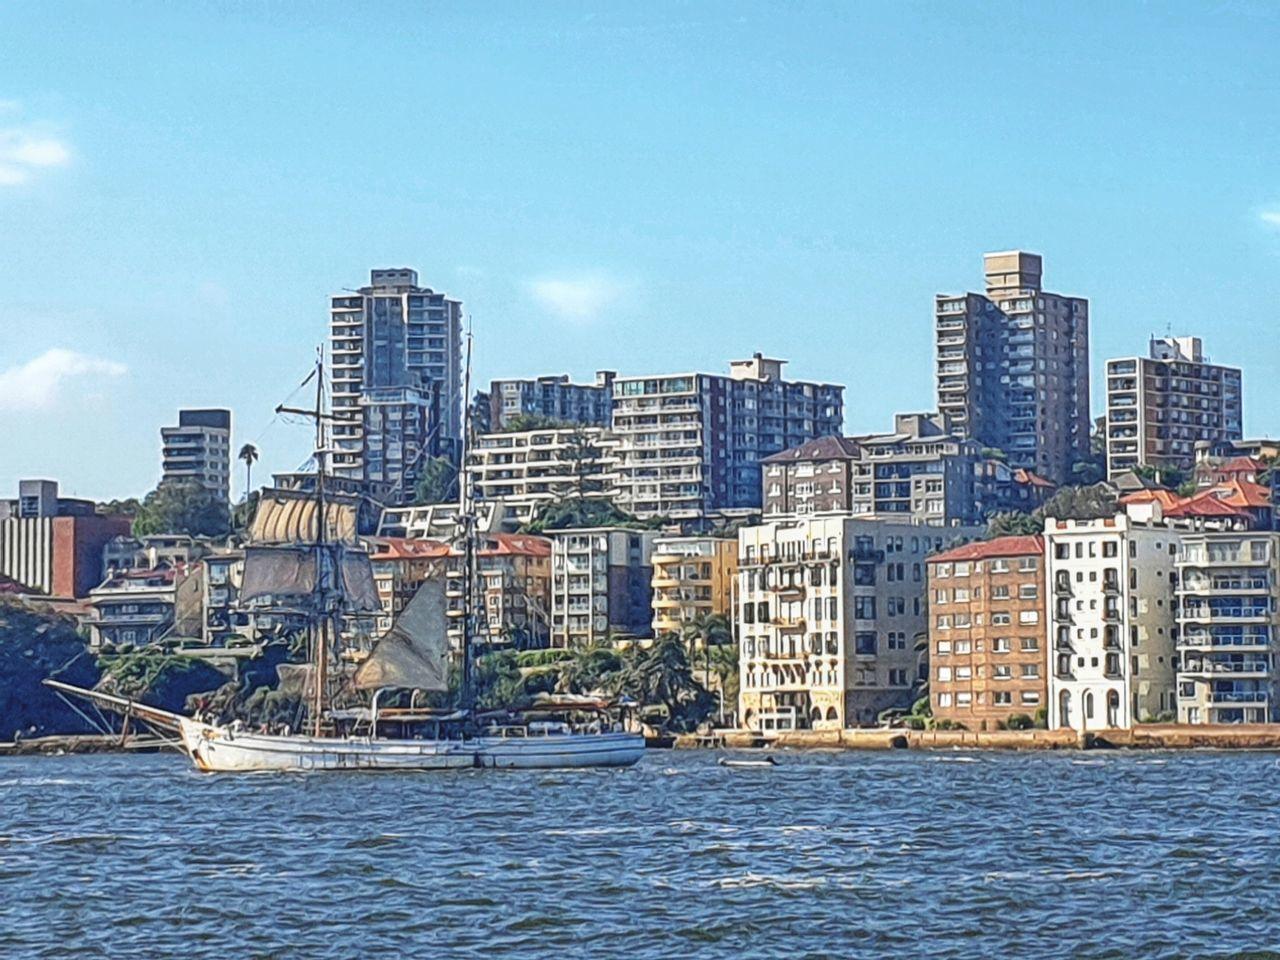 MODERN BUILDINGS BY CITY AGAINST SKY